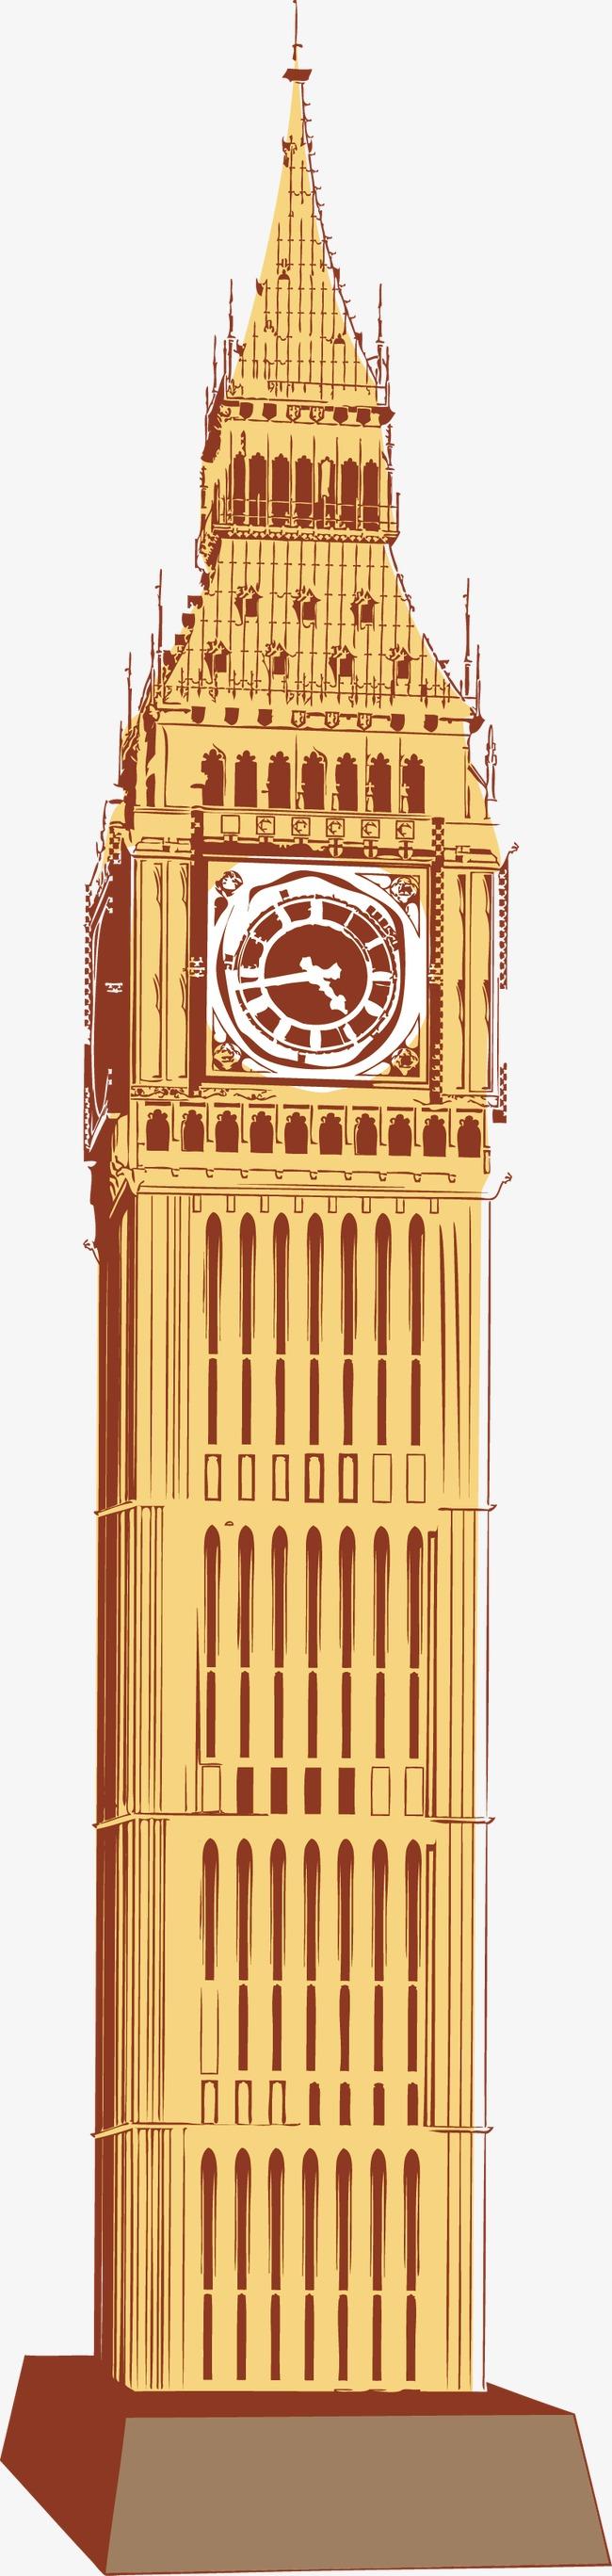 650x2735 Big Ben Vector, Building, Landmark, United Kingdom Png And Vector